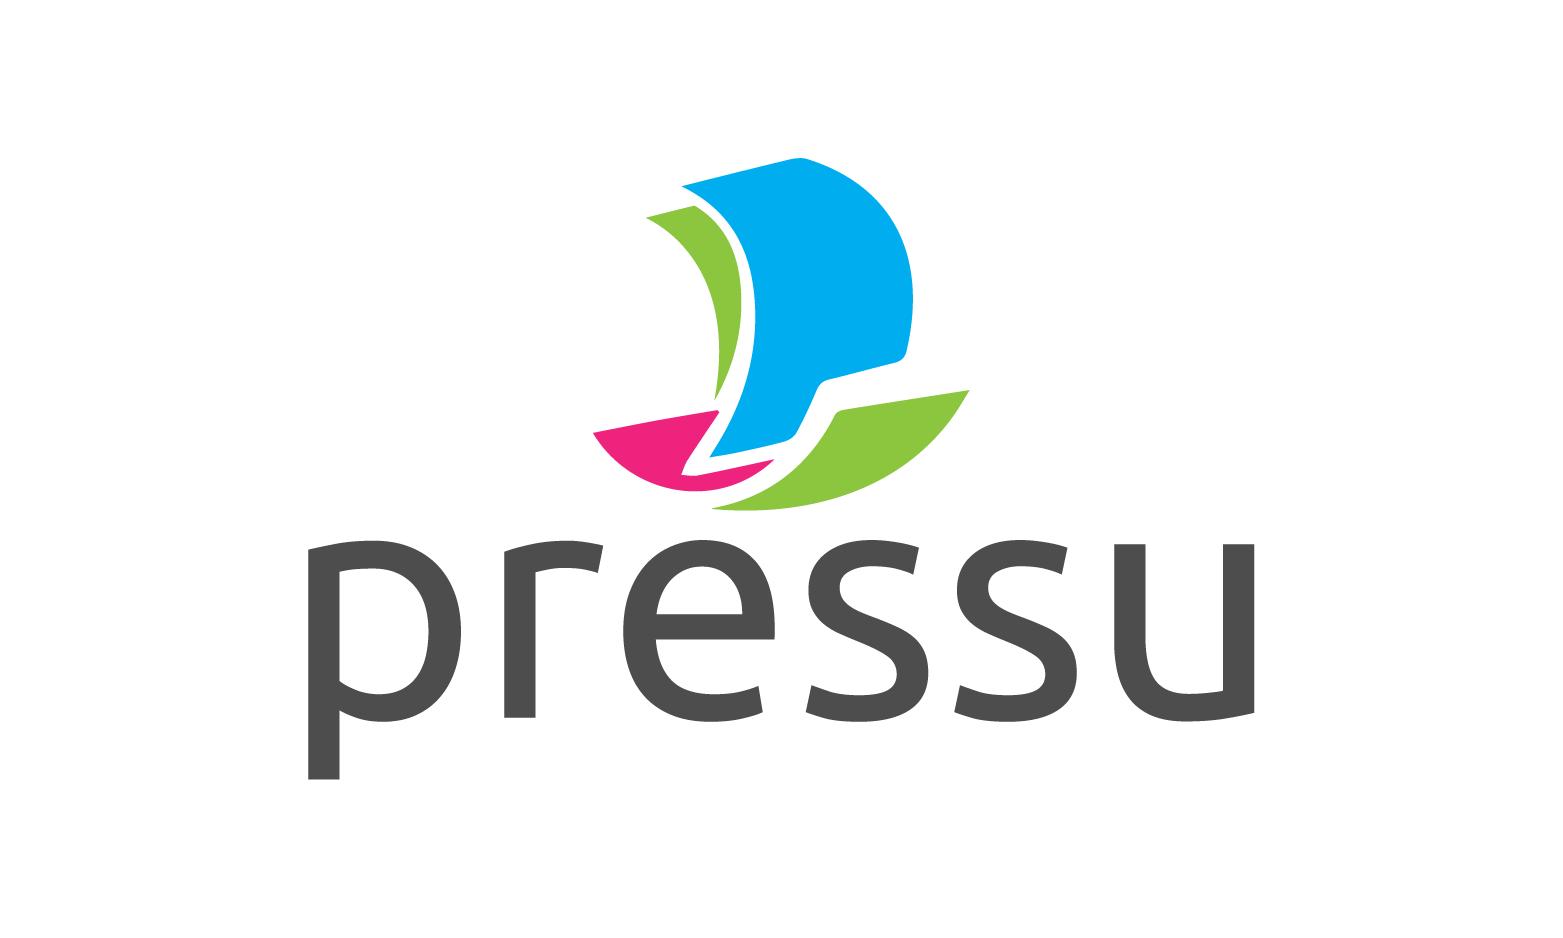 pressu.com